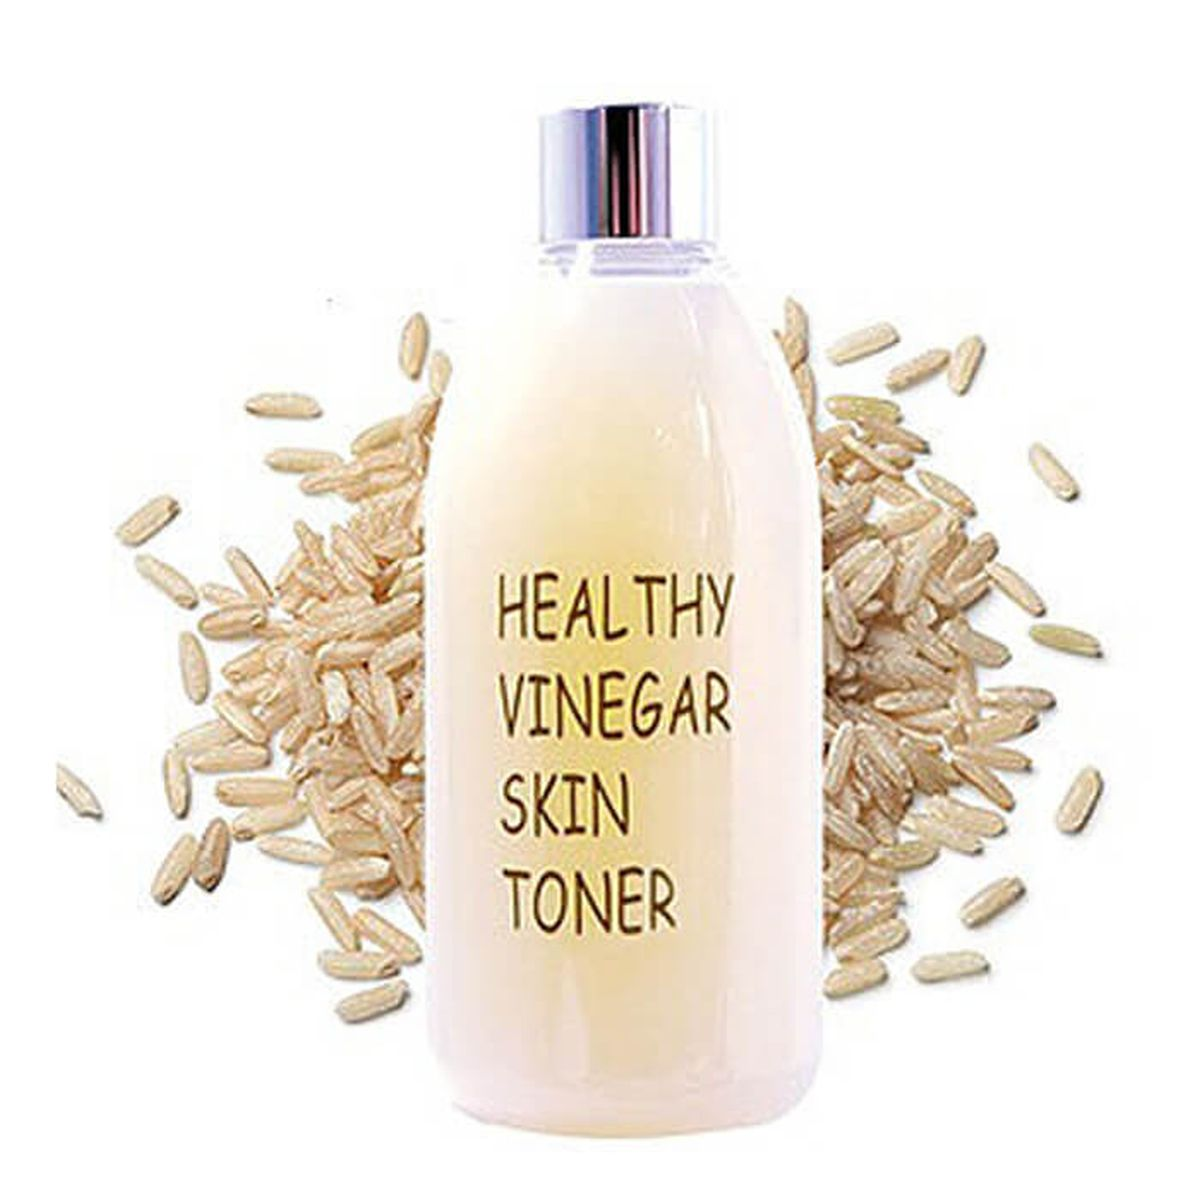 Тоник для лица с рисом Realskin Healthy Vinegar Skin Toner (Rice) - 300 мл